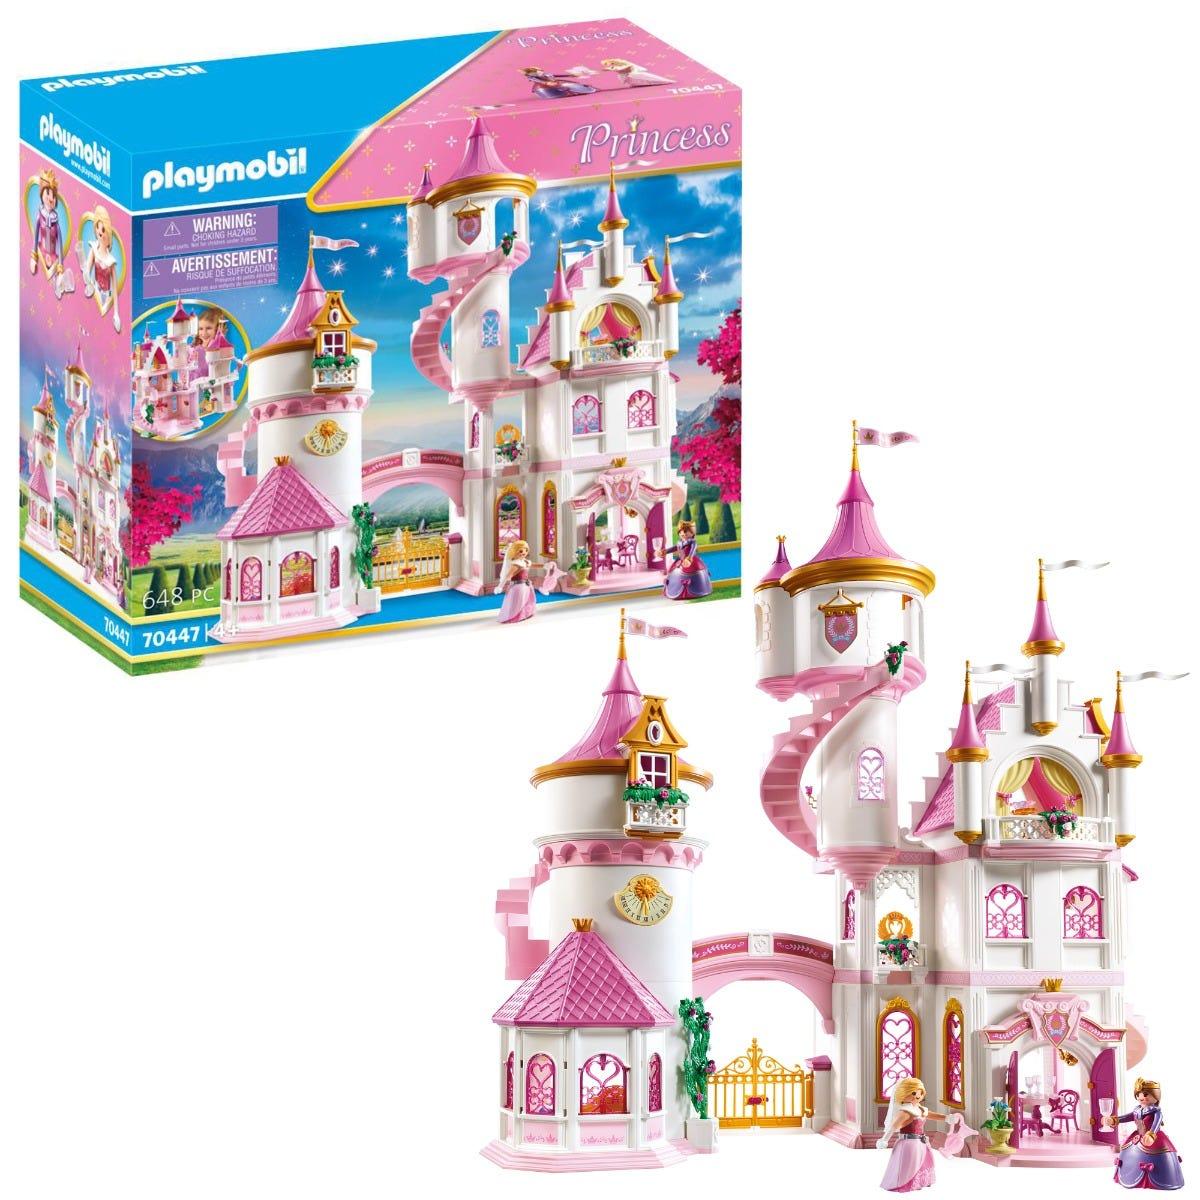 Playmobil 70447 Large Princess Castle